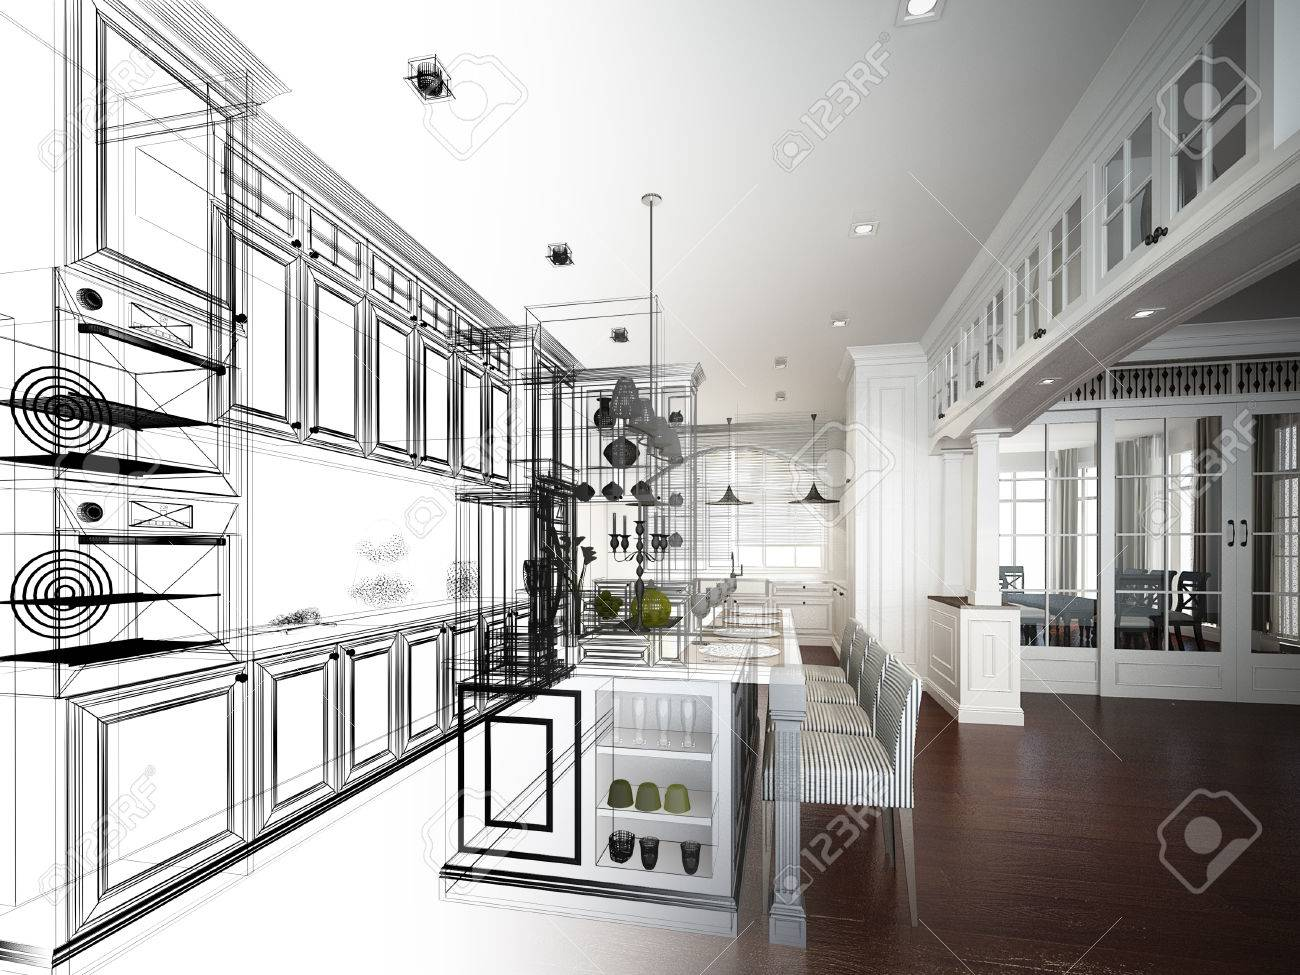 abstract sketch design of interior kitchen - 37388138